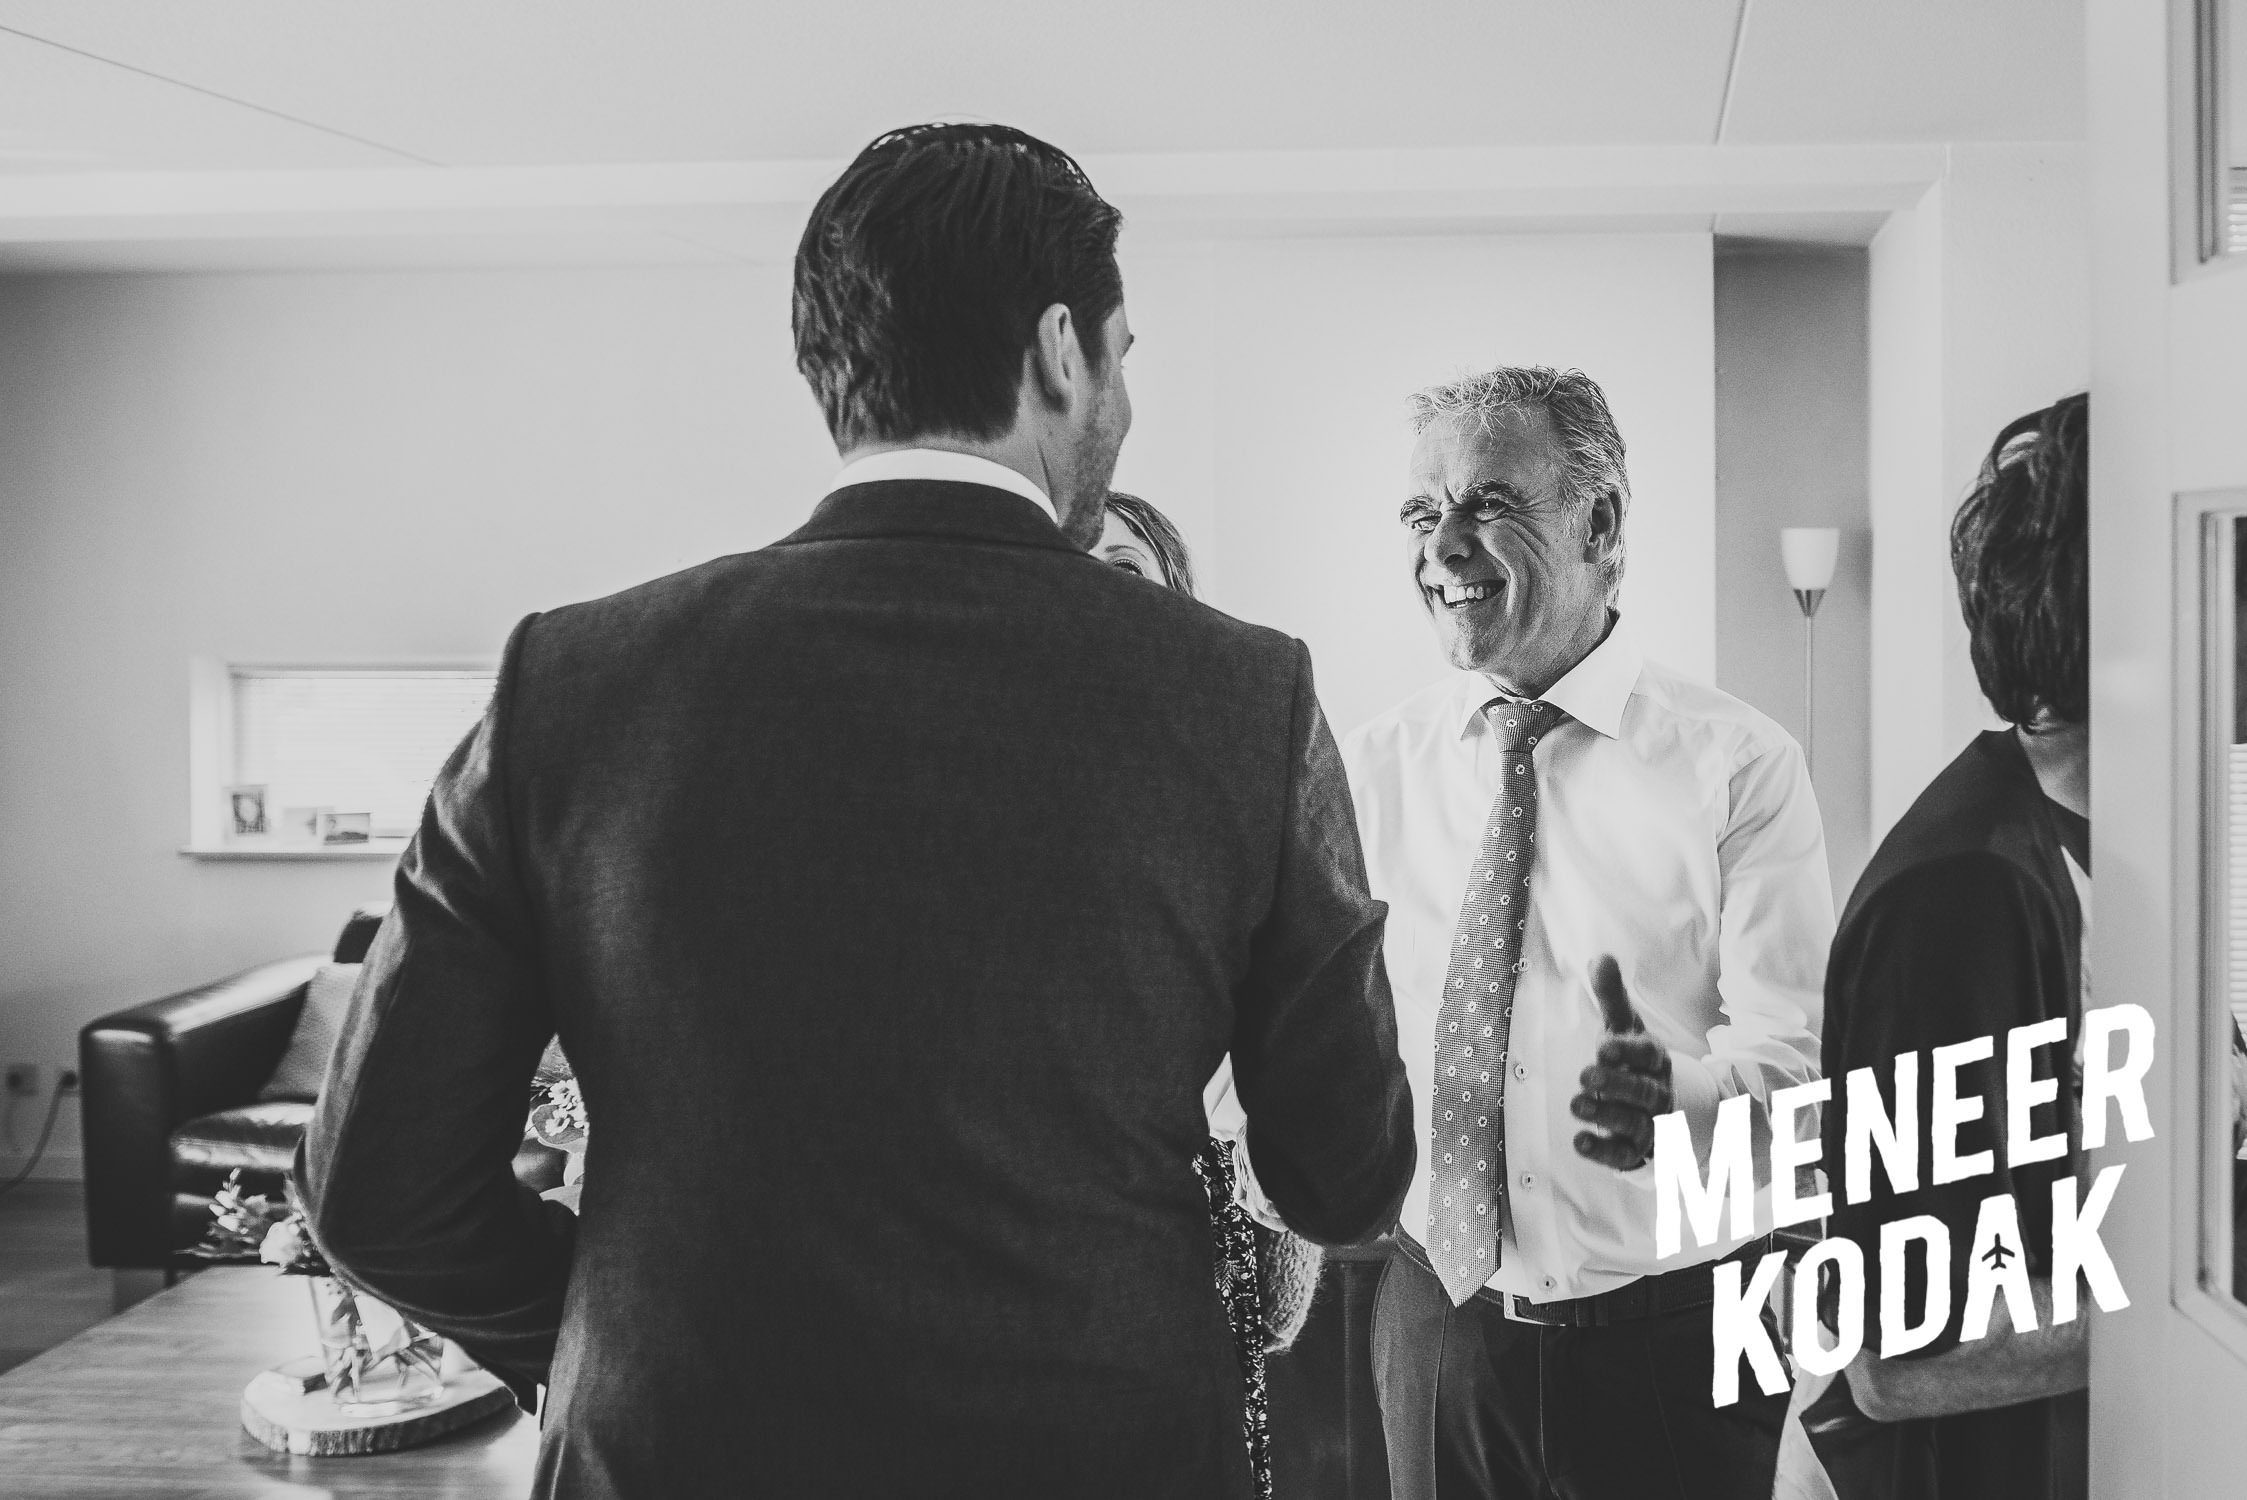 Meneer Kodak - Trouwreportage - Breda - E&M-068.jpg